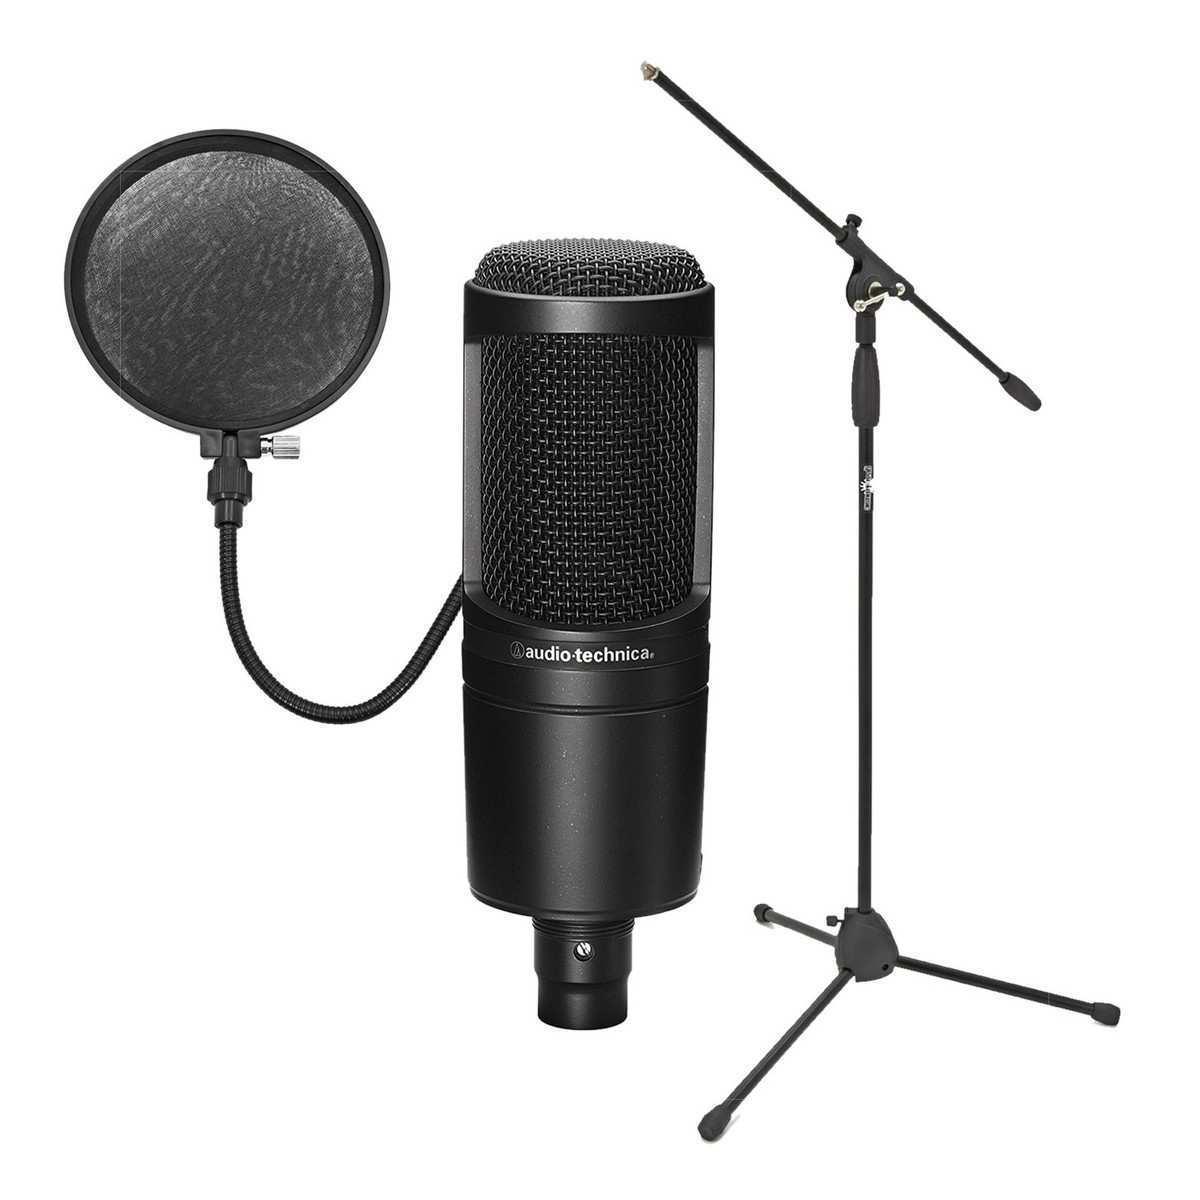 70 Best Review Audio Technica 2020 Price for Audio Technica 2020